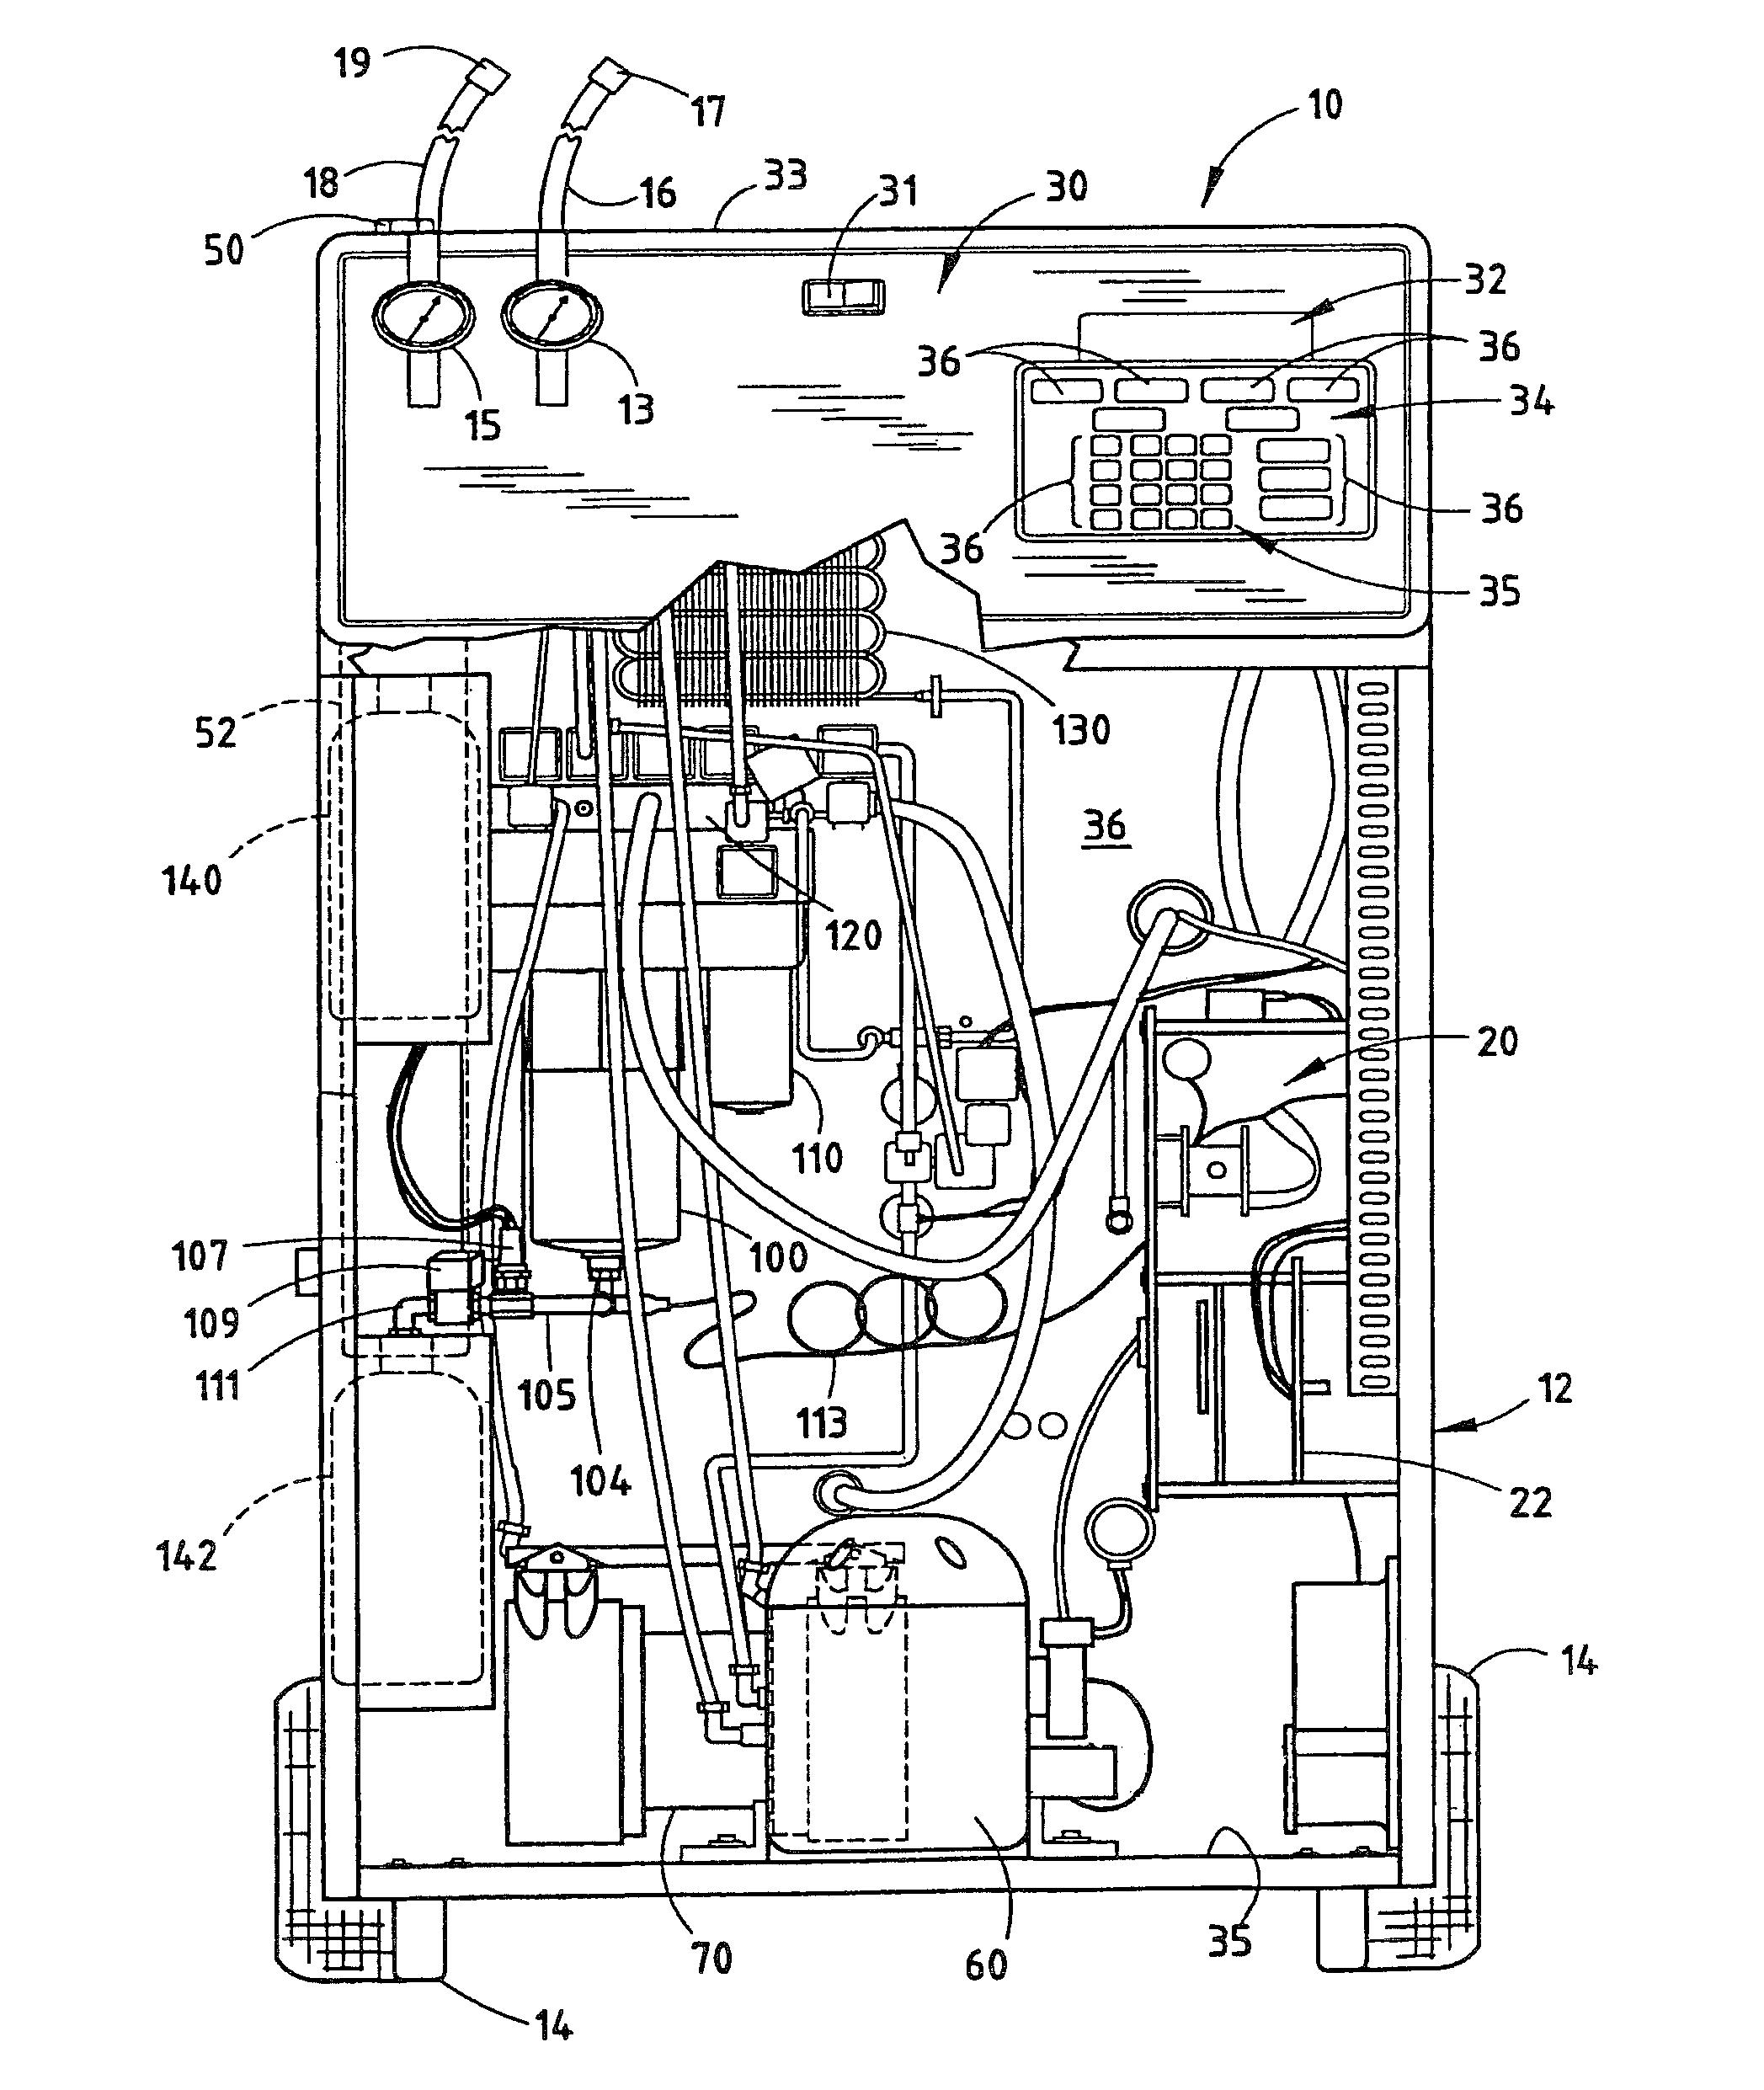 [diagram] 34988 robinair ac unit wiring diagram full ... 34988 robinair ac unit wiring diagram